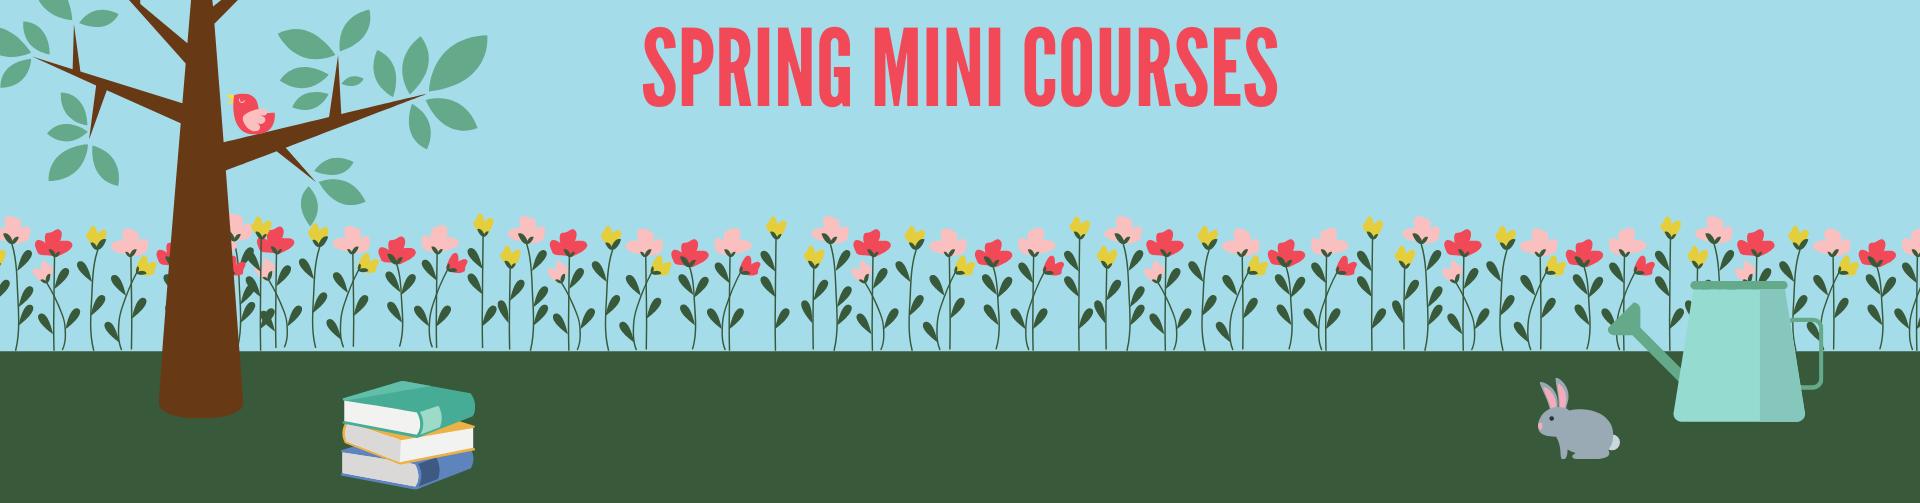 SSMU MiniCourses